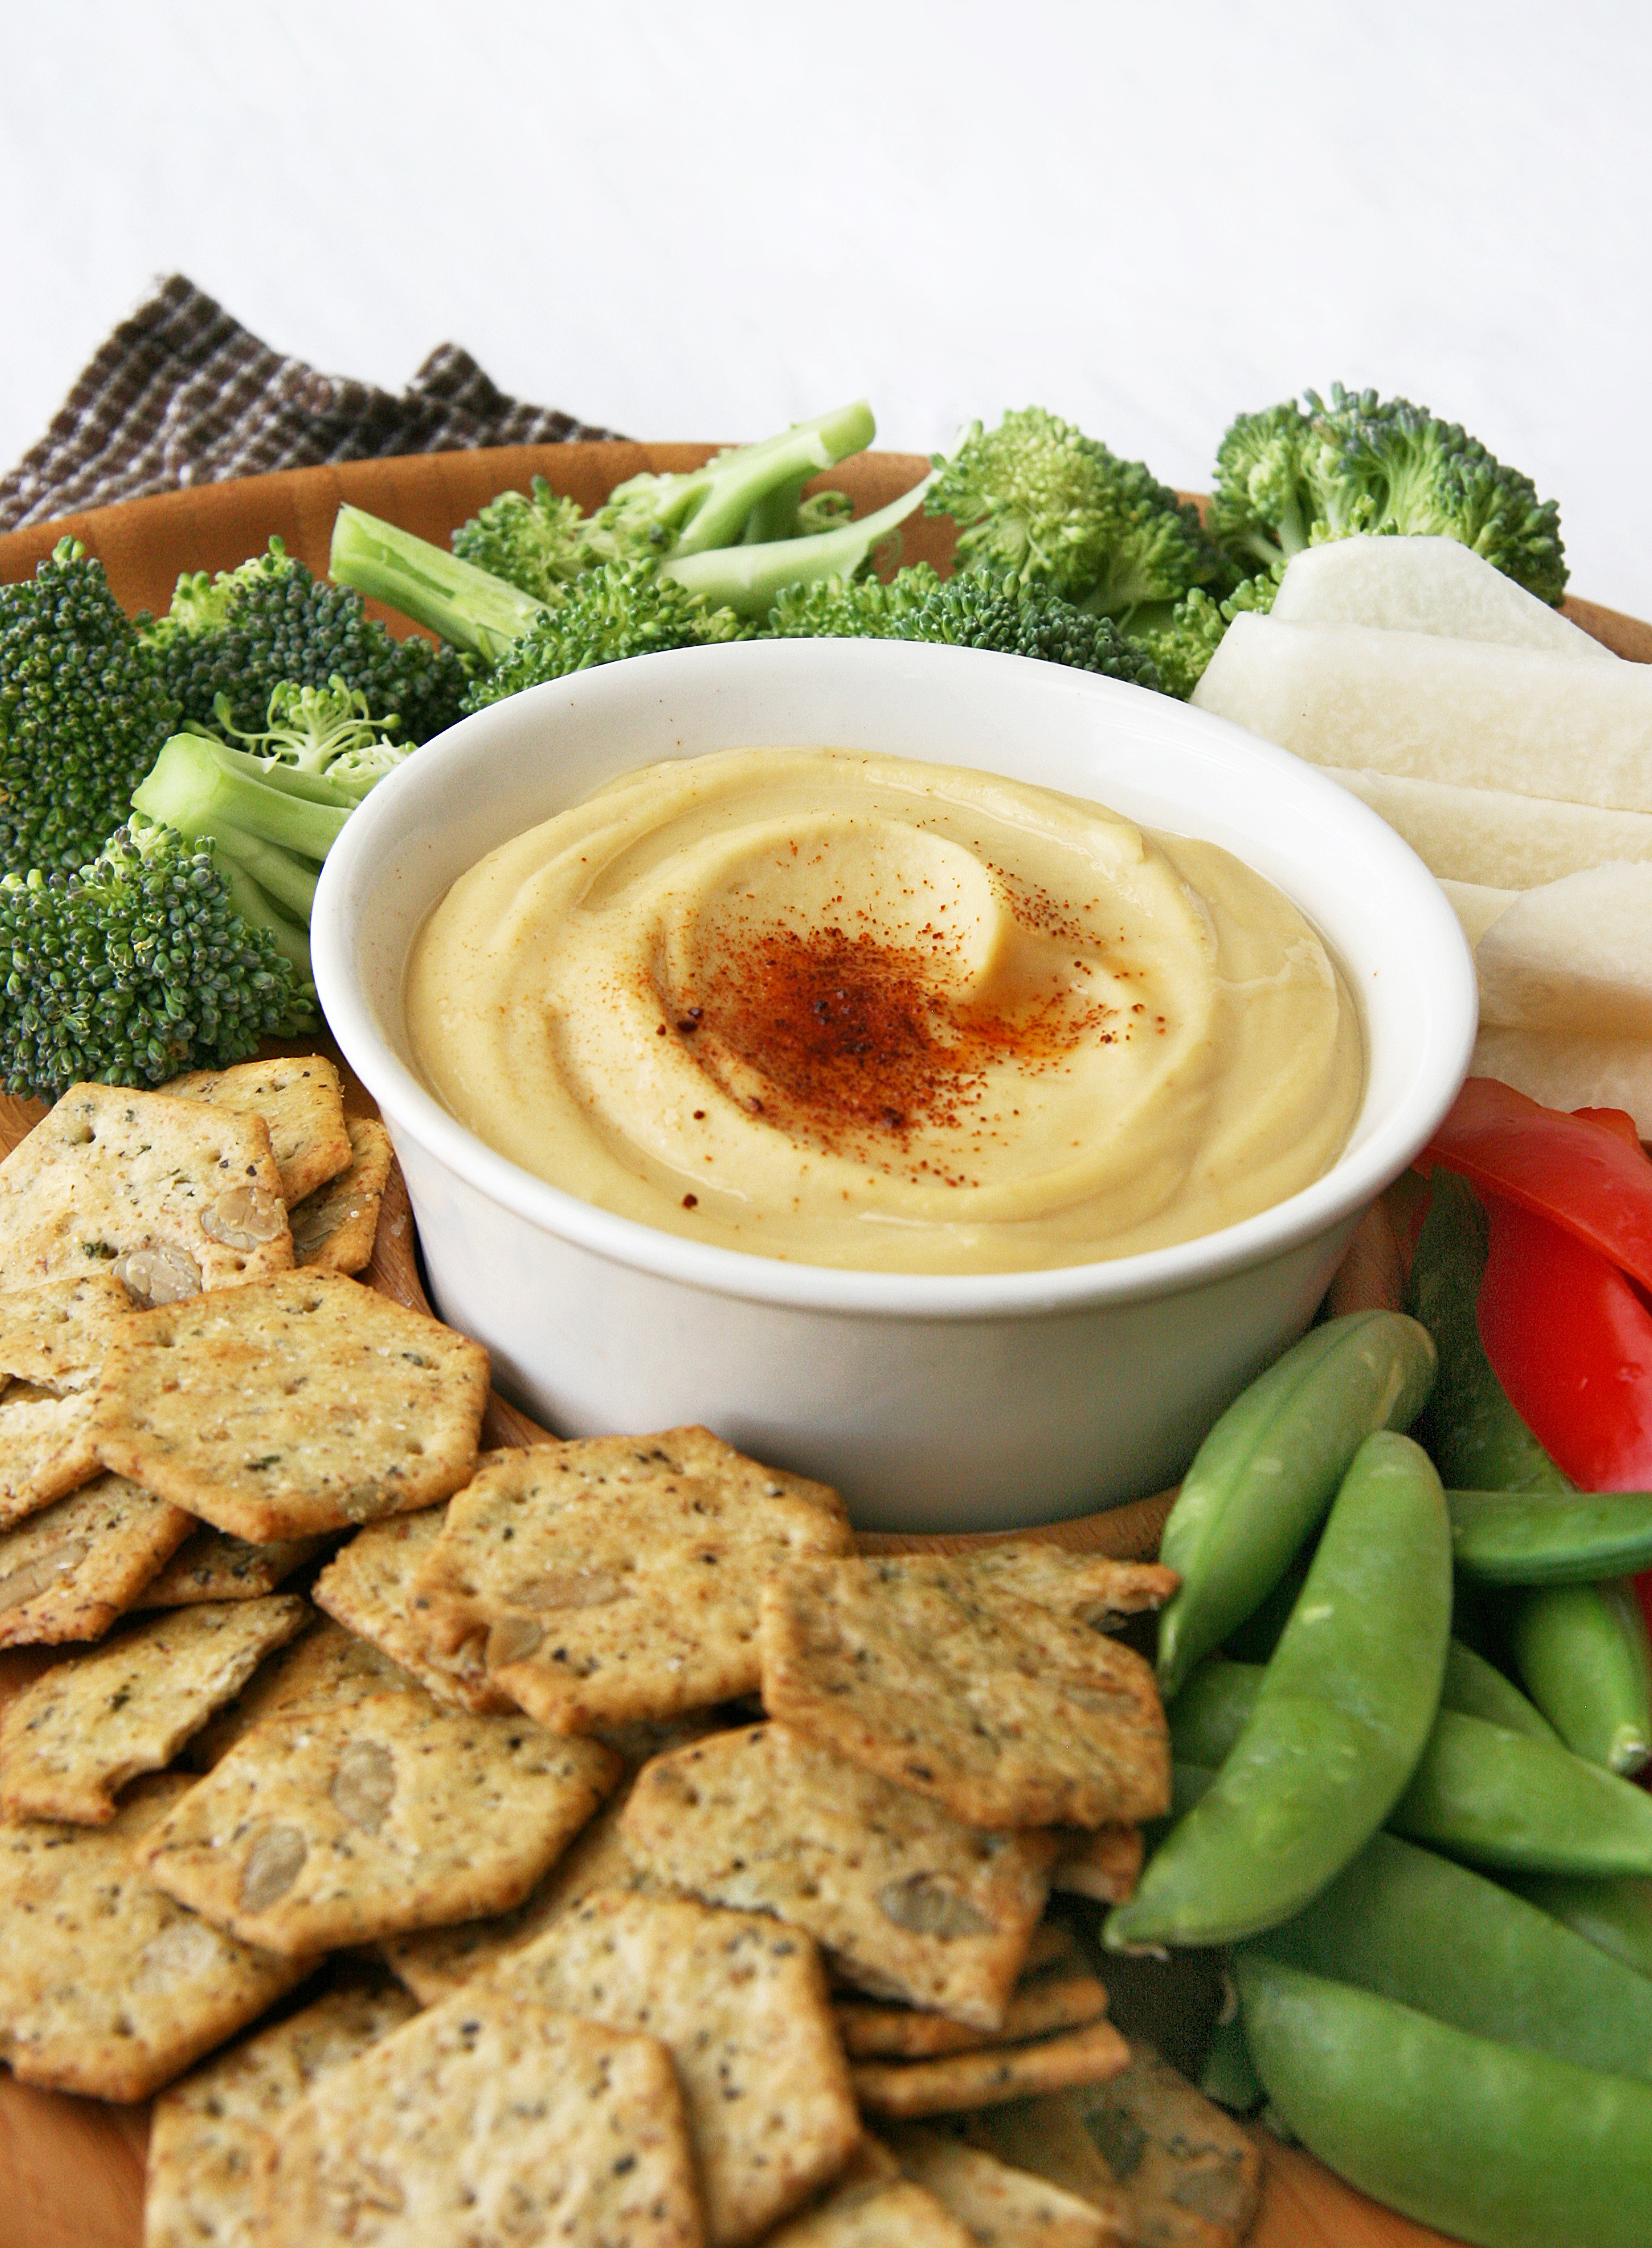 Creamiest Homemade Hummus…Ever | Natural Noshing